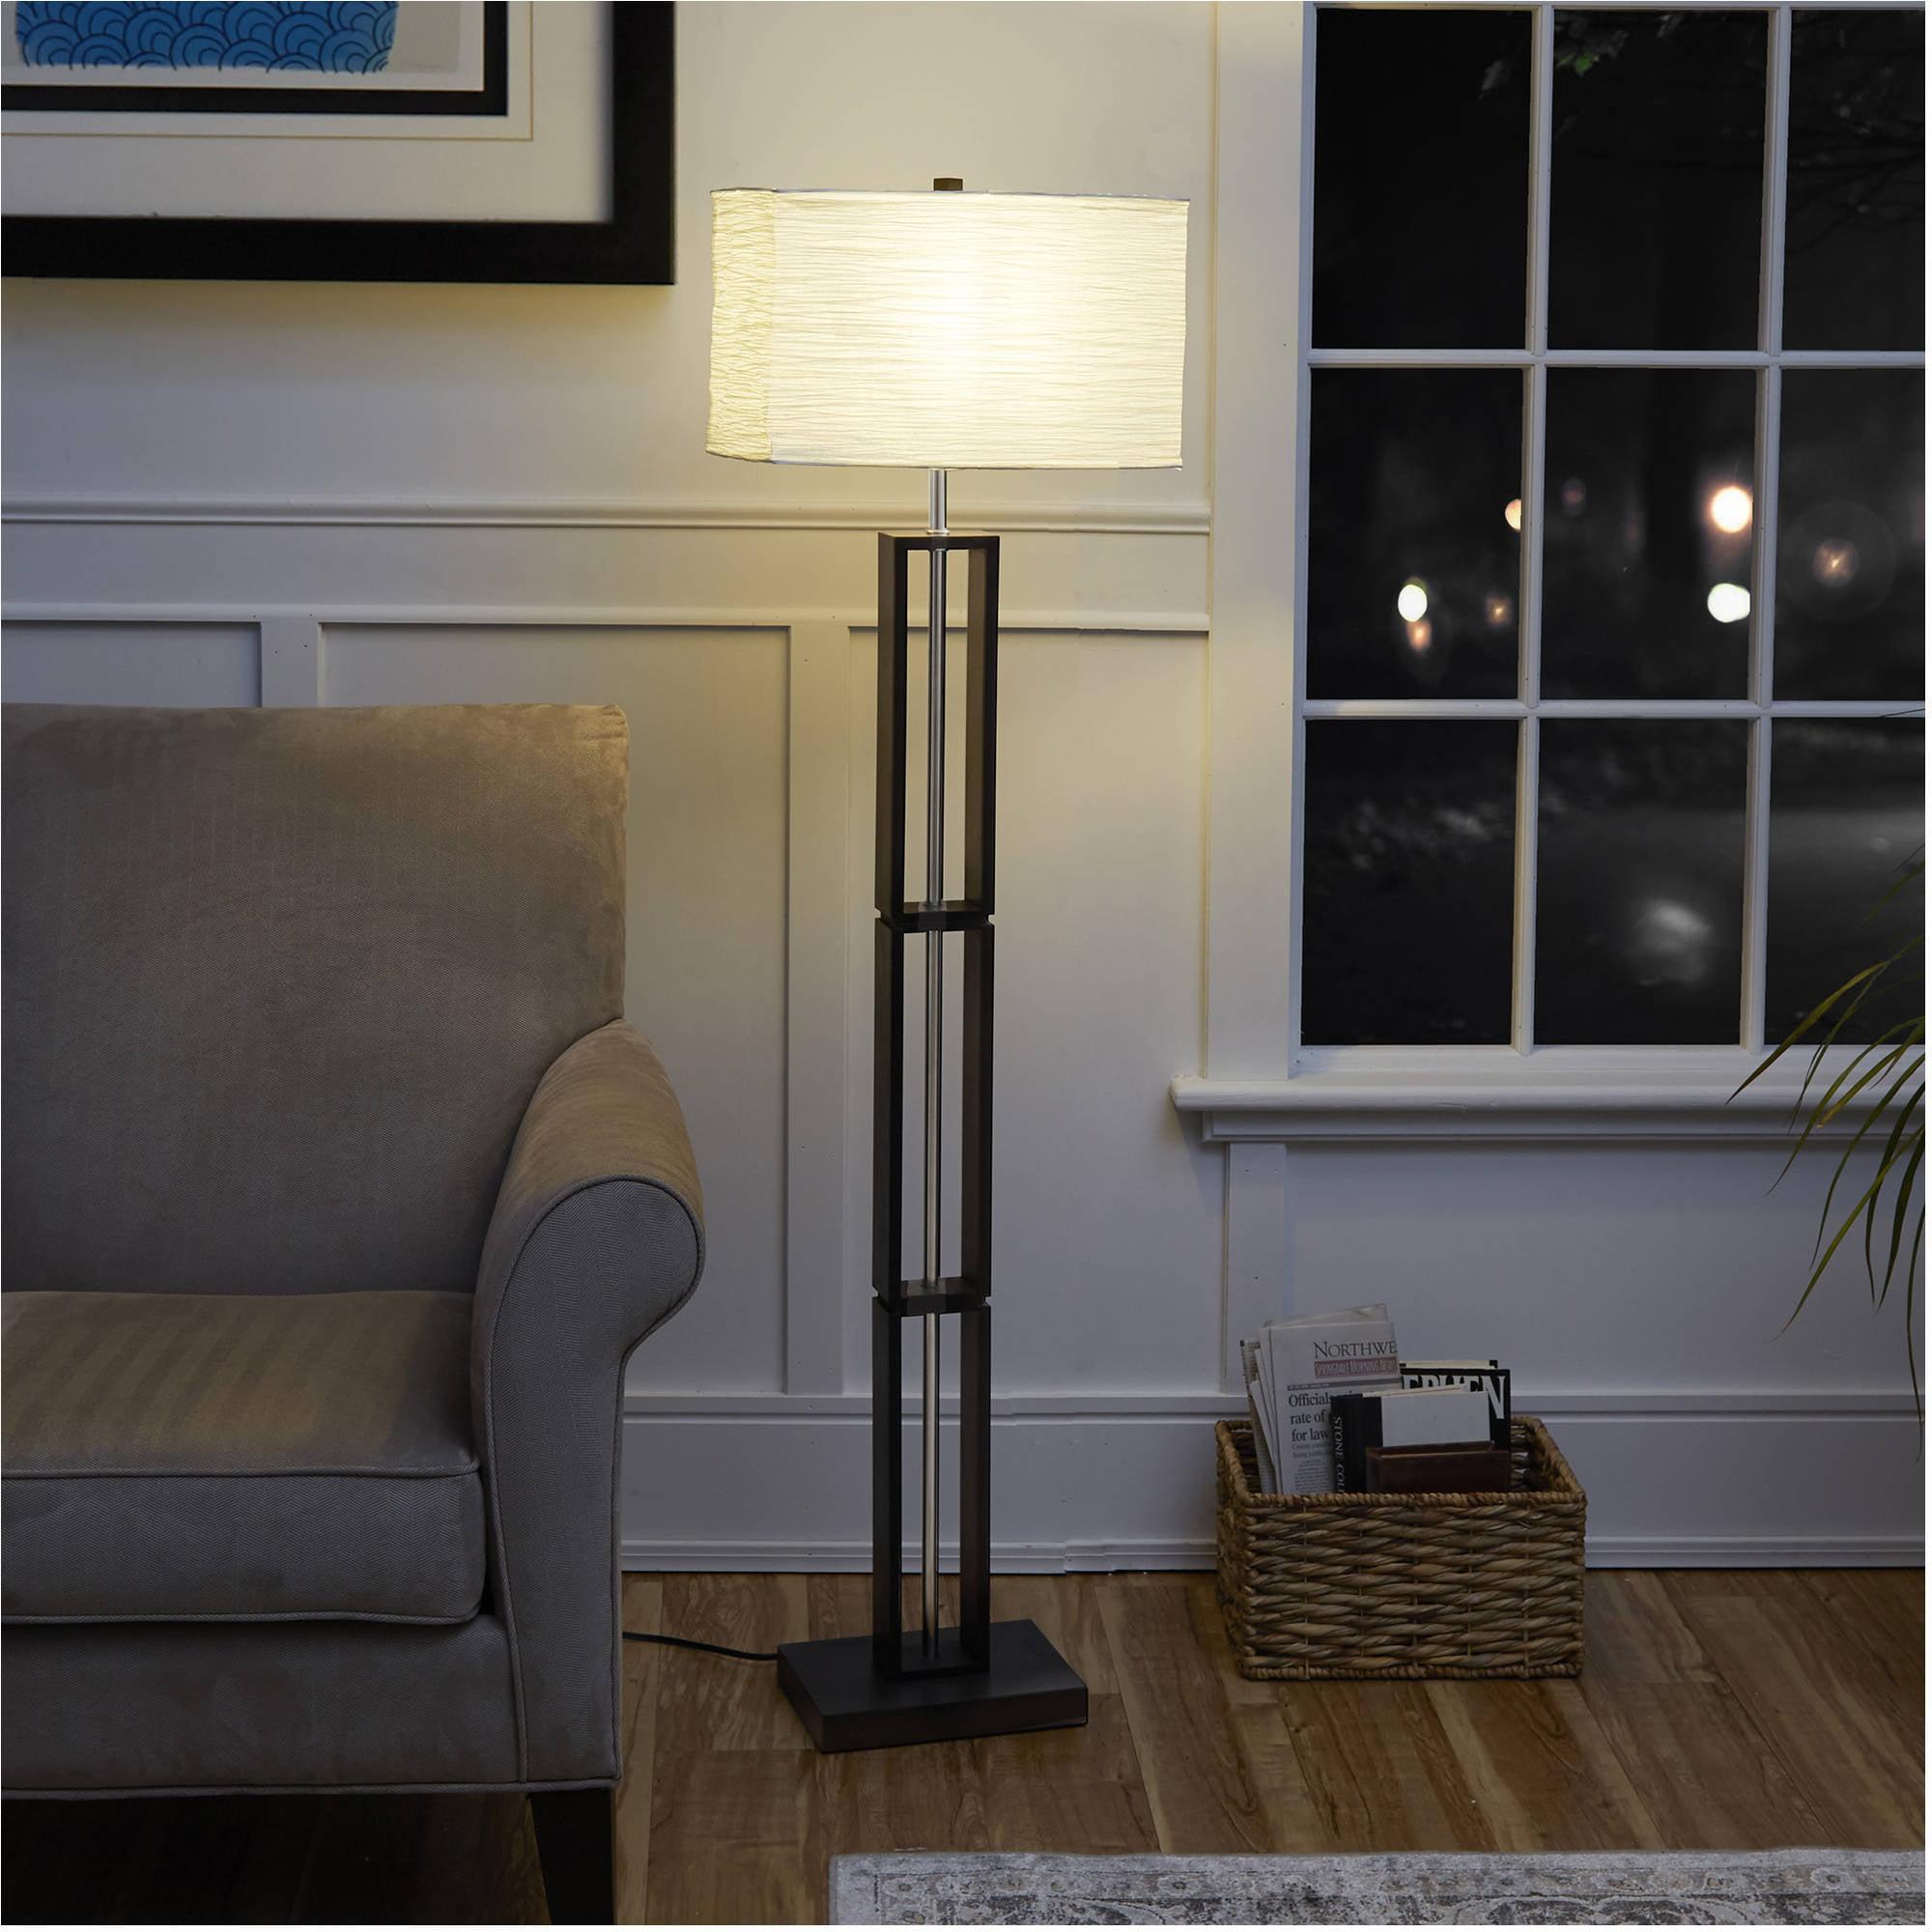 Modern Paper Floor Lamp: Mainstays Dark Wood Floor Lamp With Rice Paper Shade, 58